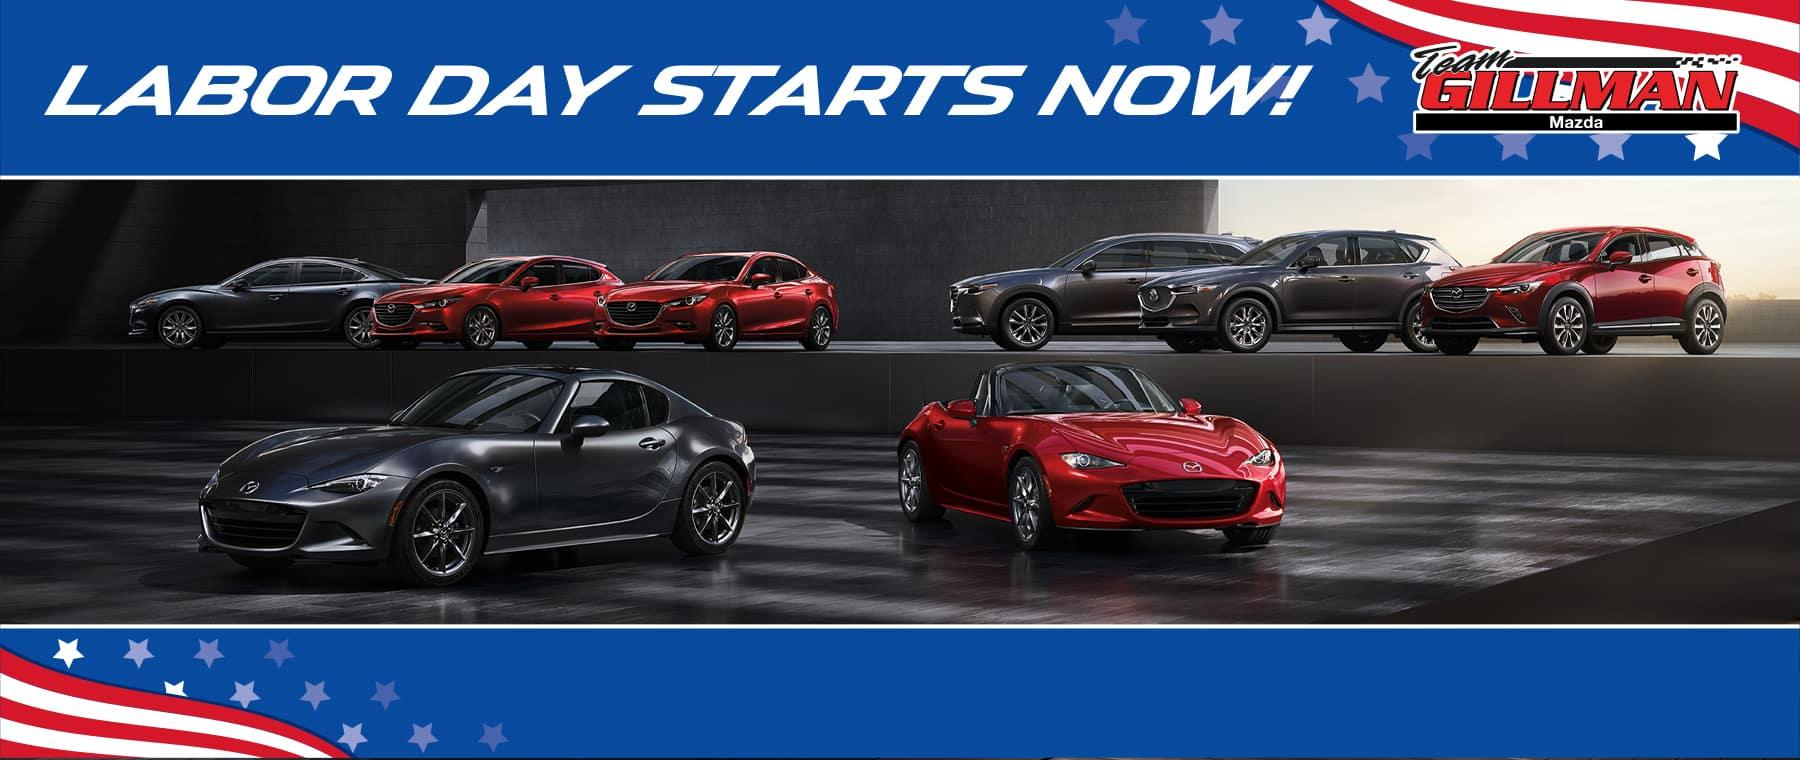 Labor-Day-Starts-Now-Mazda